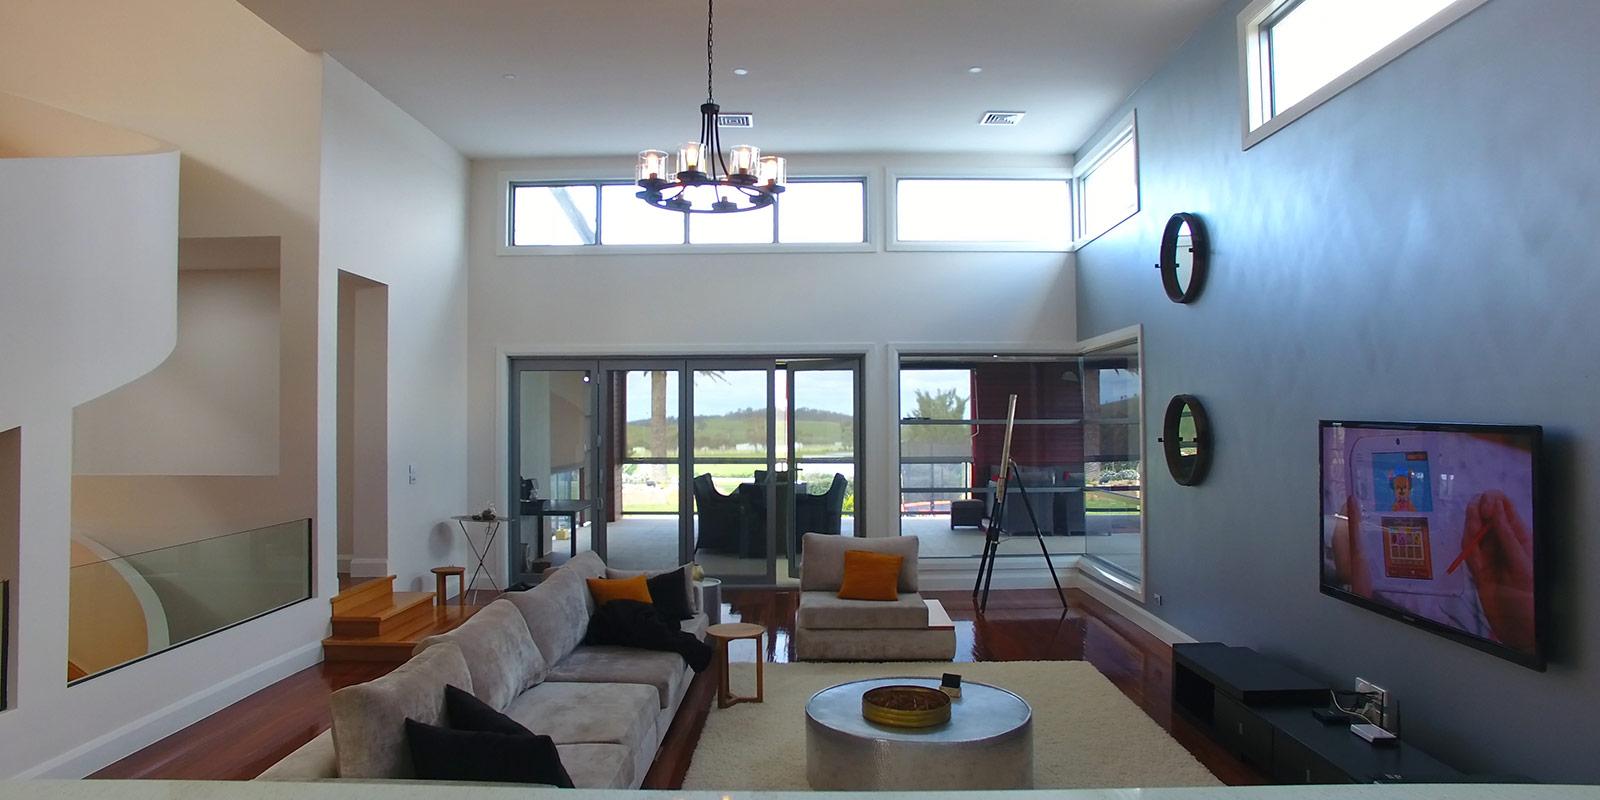 Indoor Drone Video Services